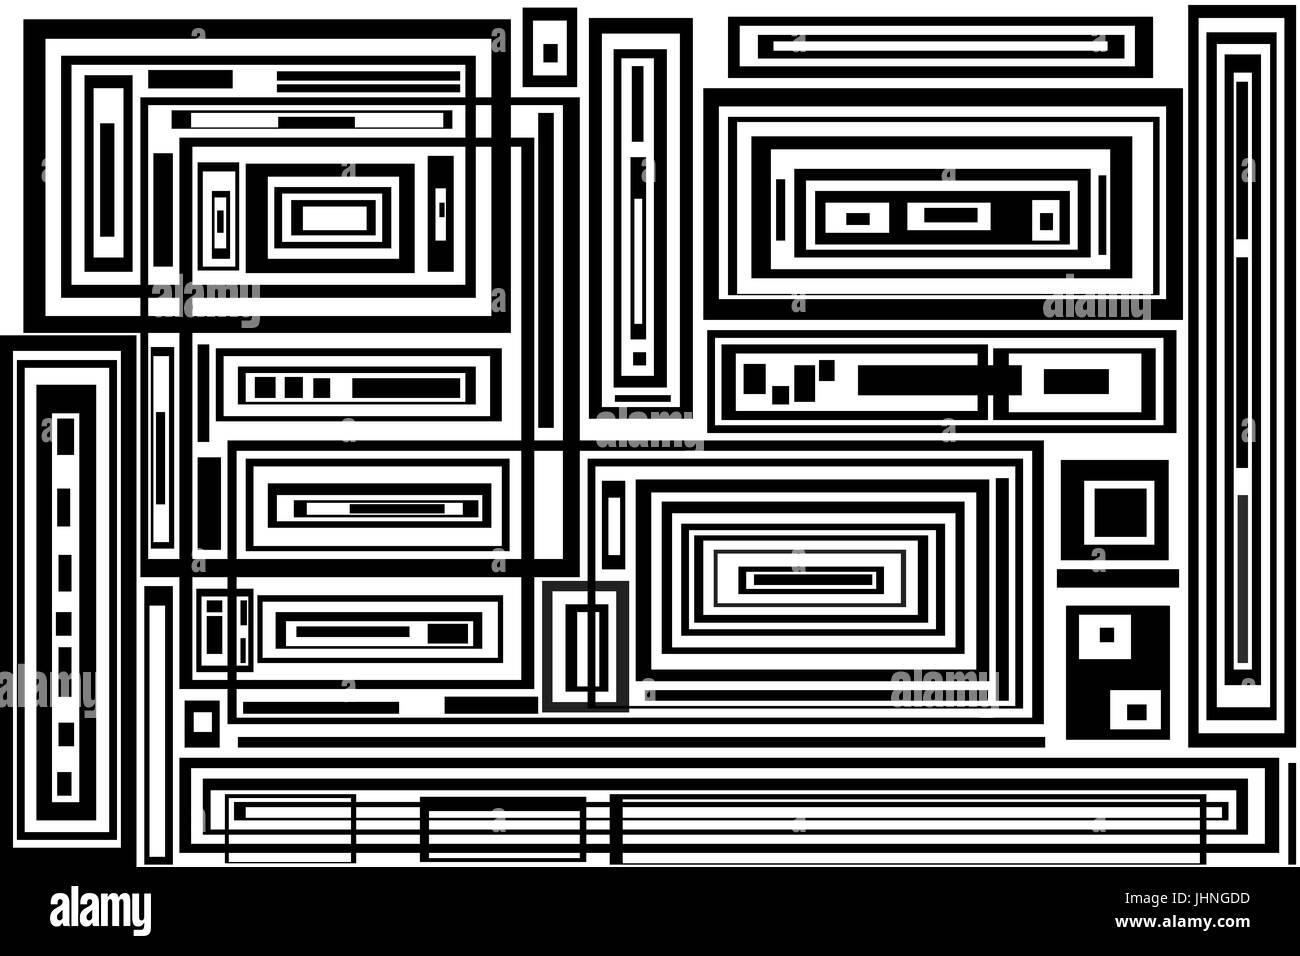 Stockhausen - Stock Image